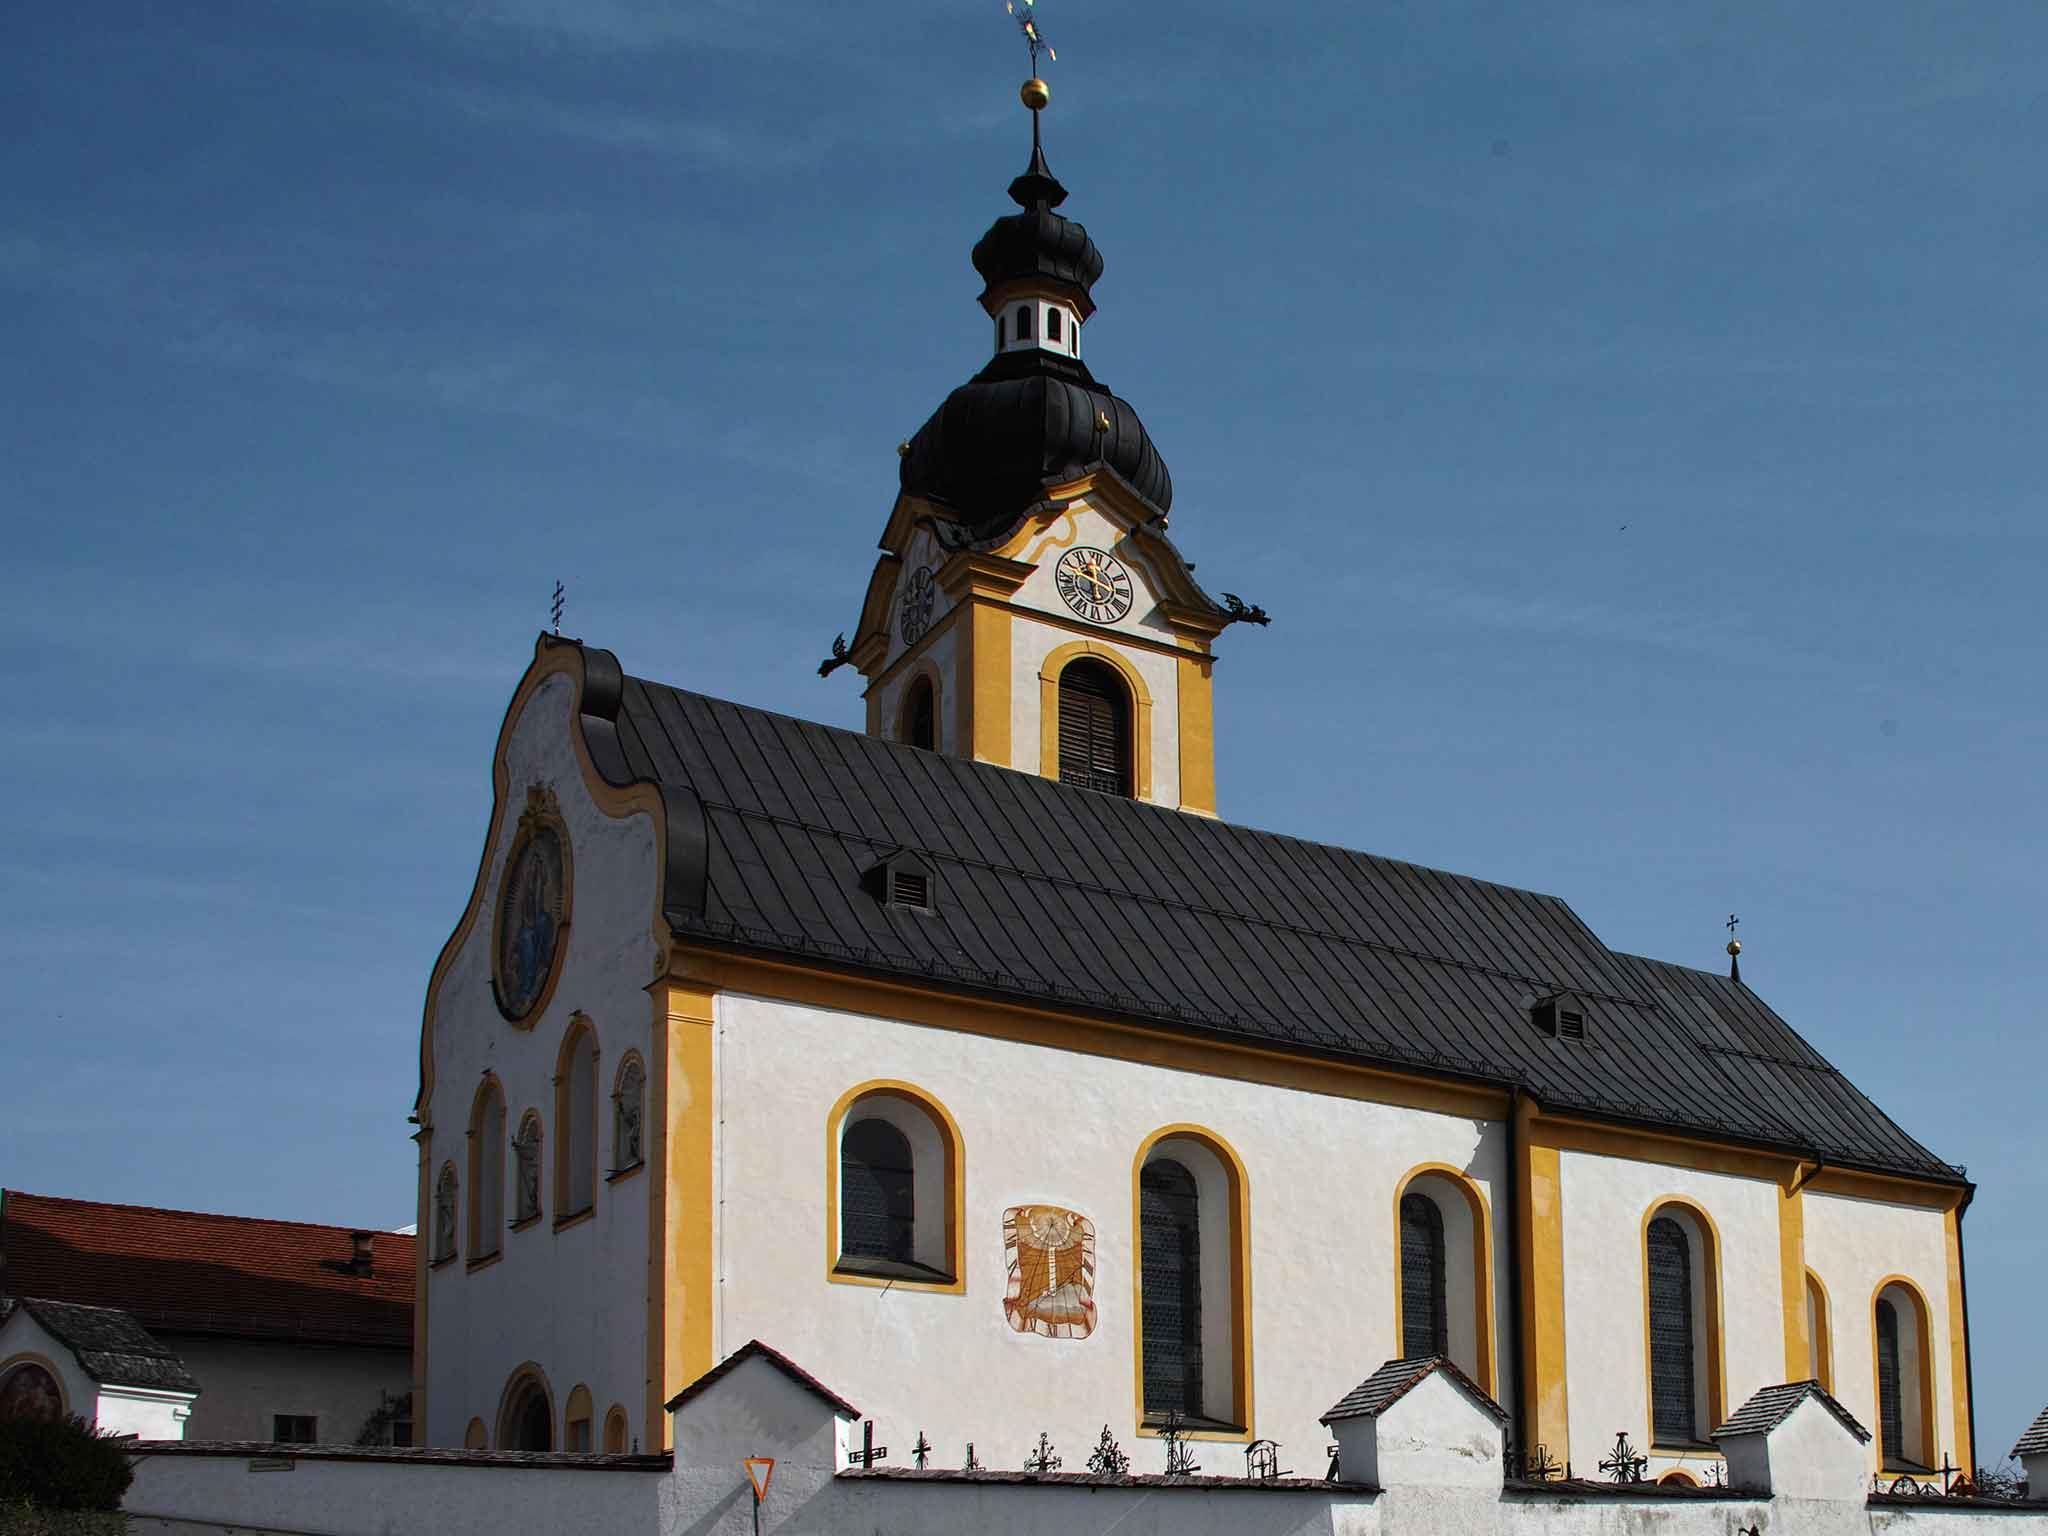 Pfarrkirche Oberperfuss